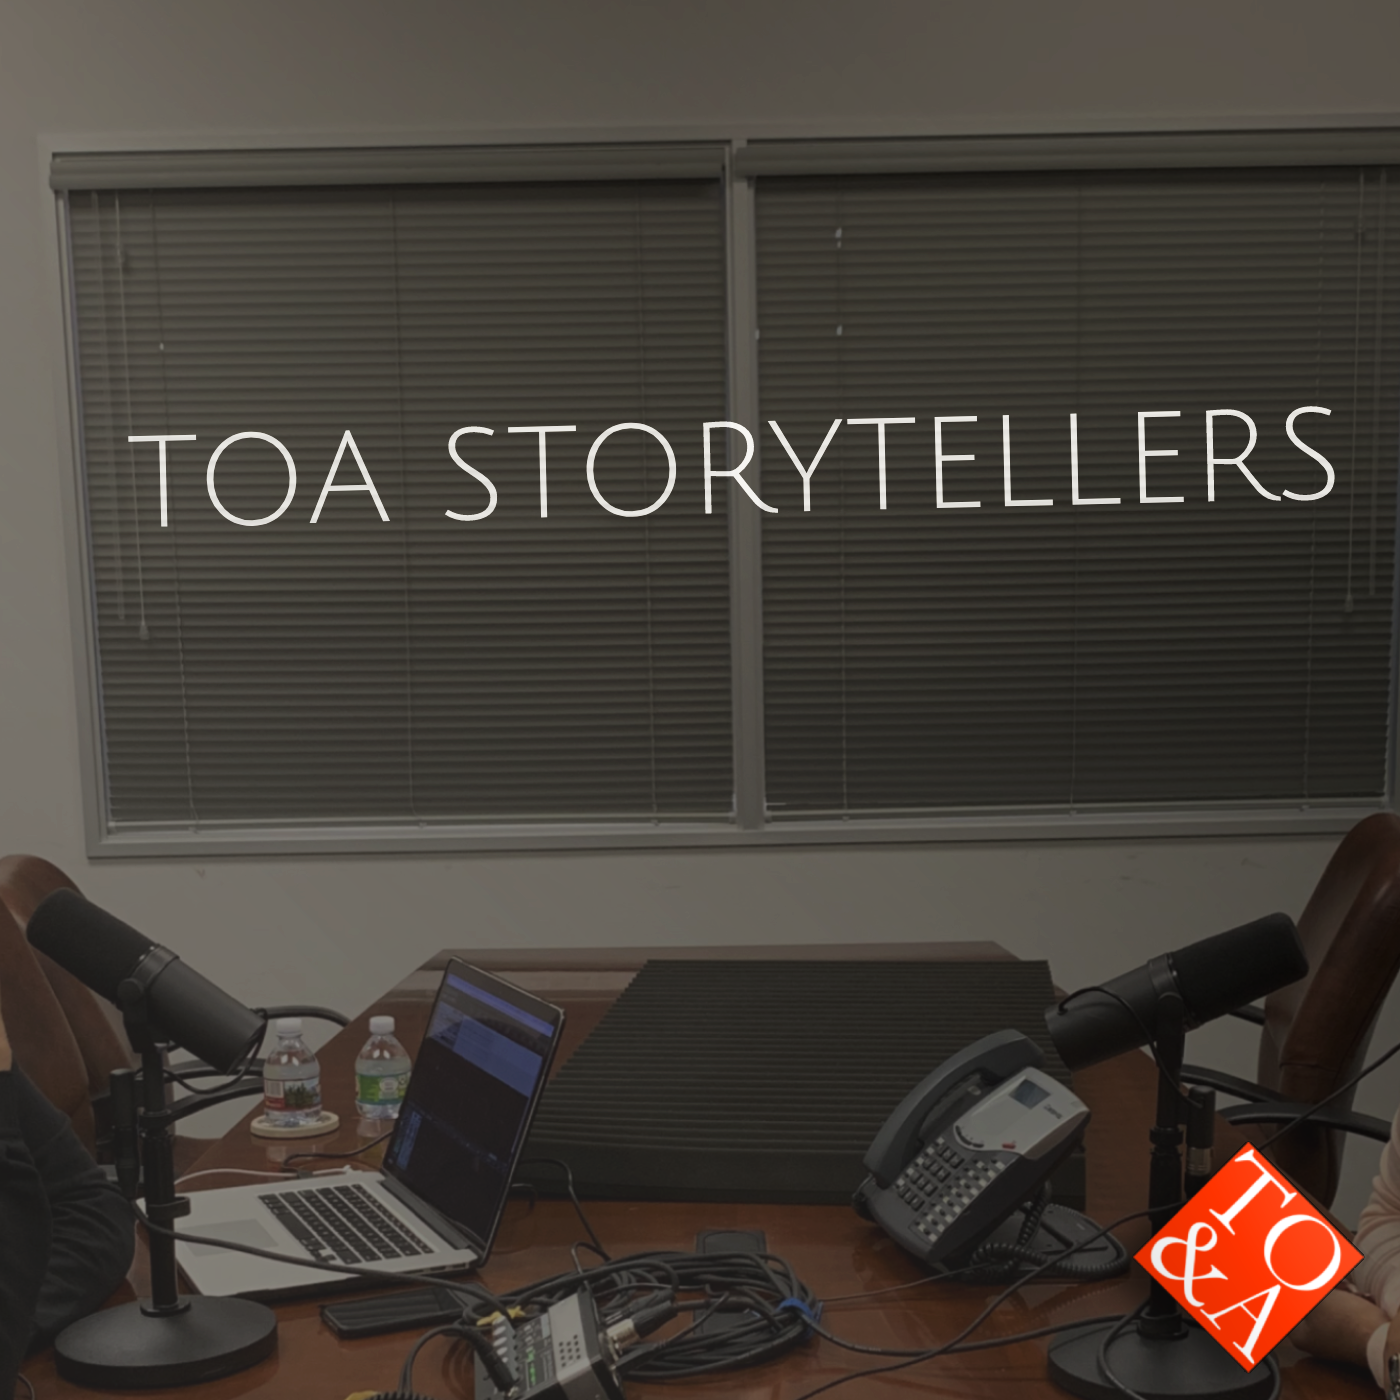 TOA Storytellers show art